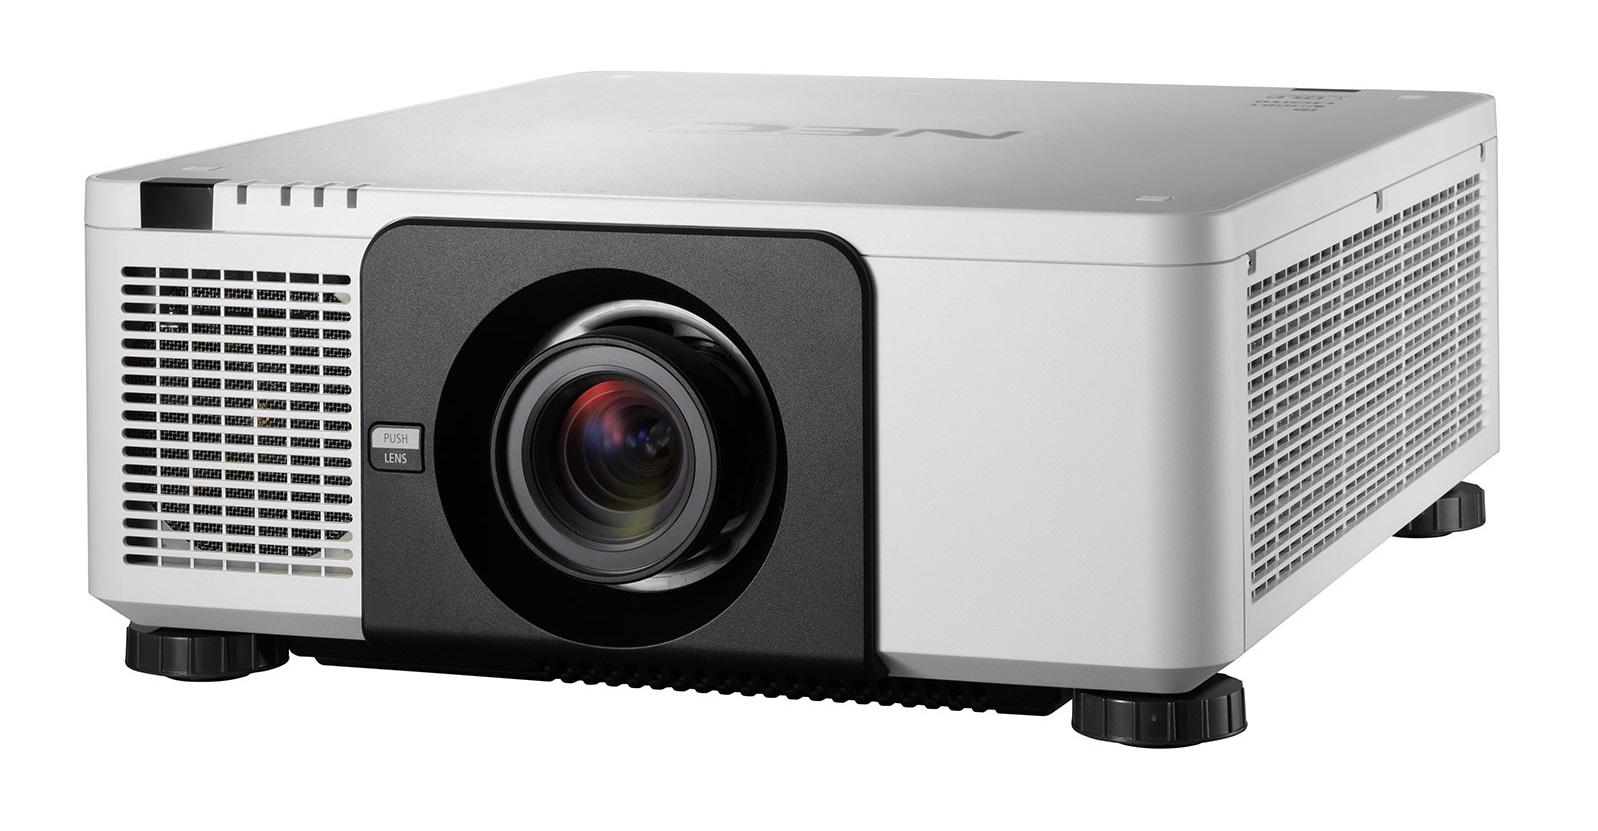 Projector Px803ul-wh 8000lm Dlp Wuxga 1920x1200 4k 4096x2160